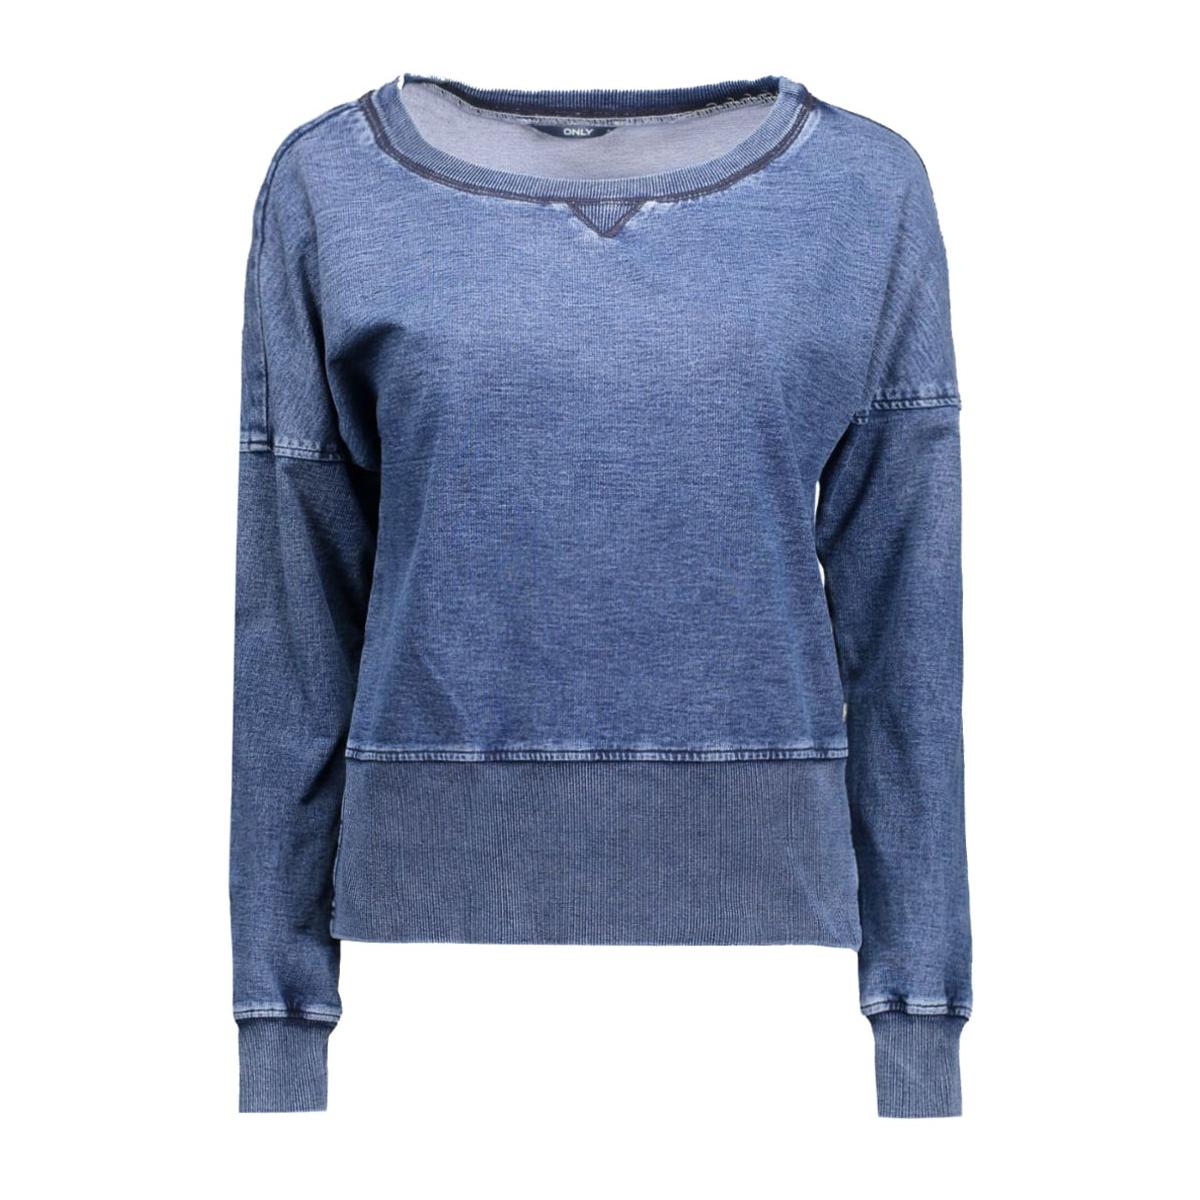 onljem l/s jog blouse dnm 15119418 only sweater medium blue denim